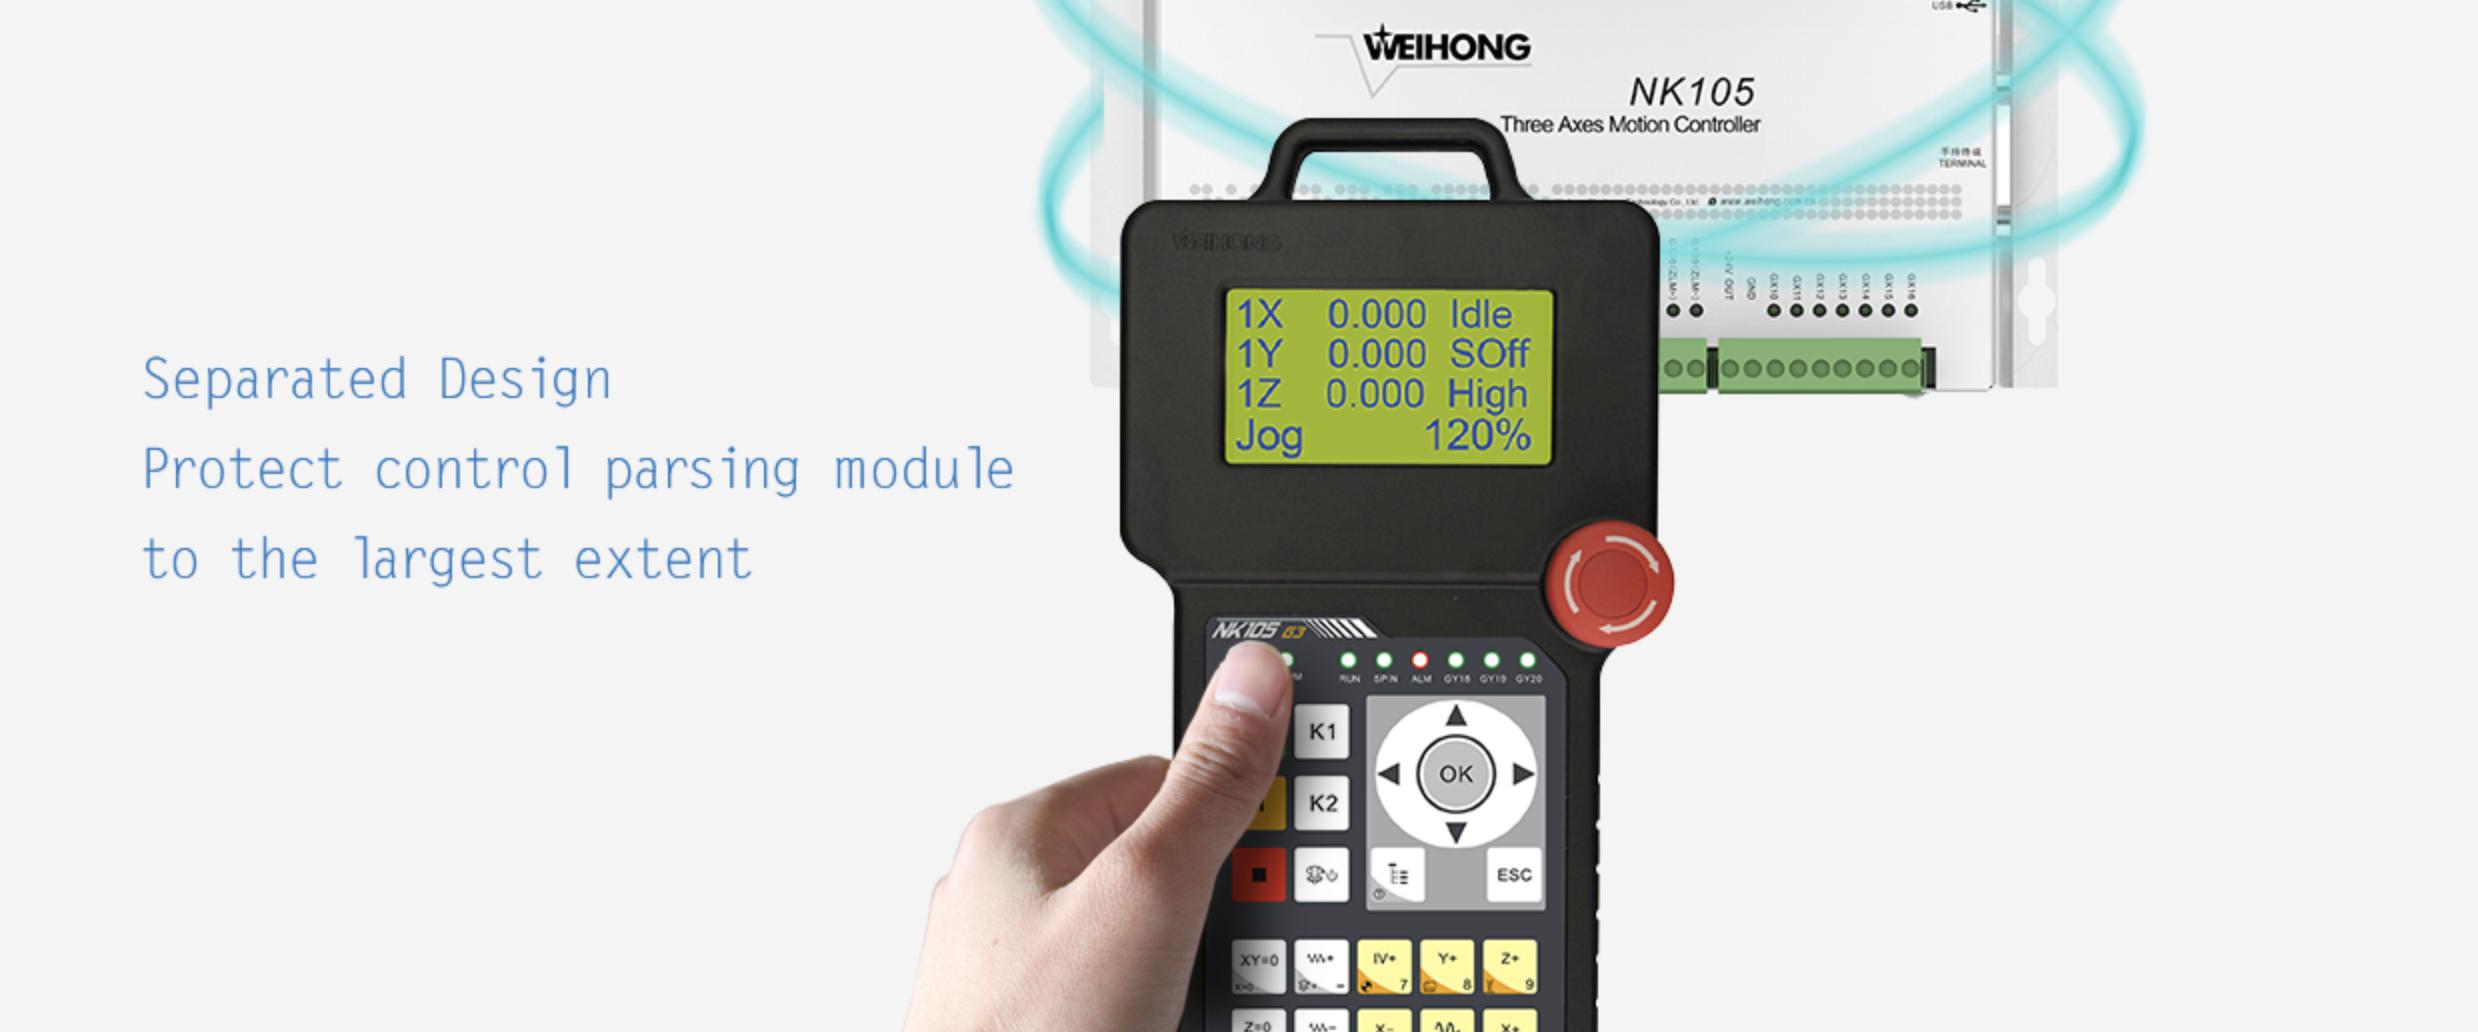 Handheld NK105 Controller 1